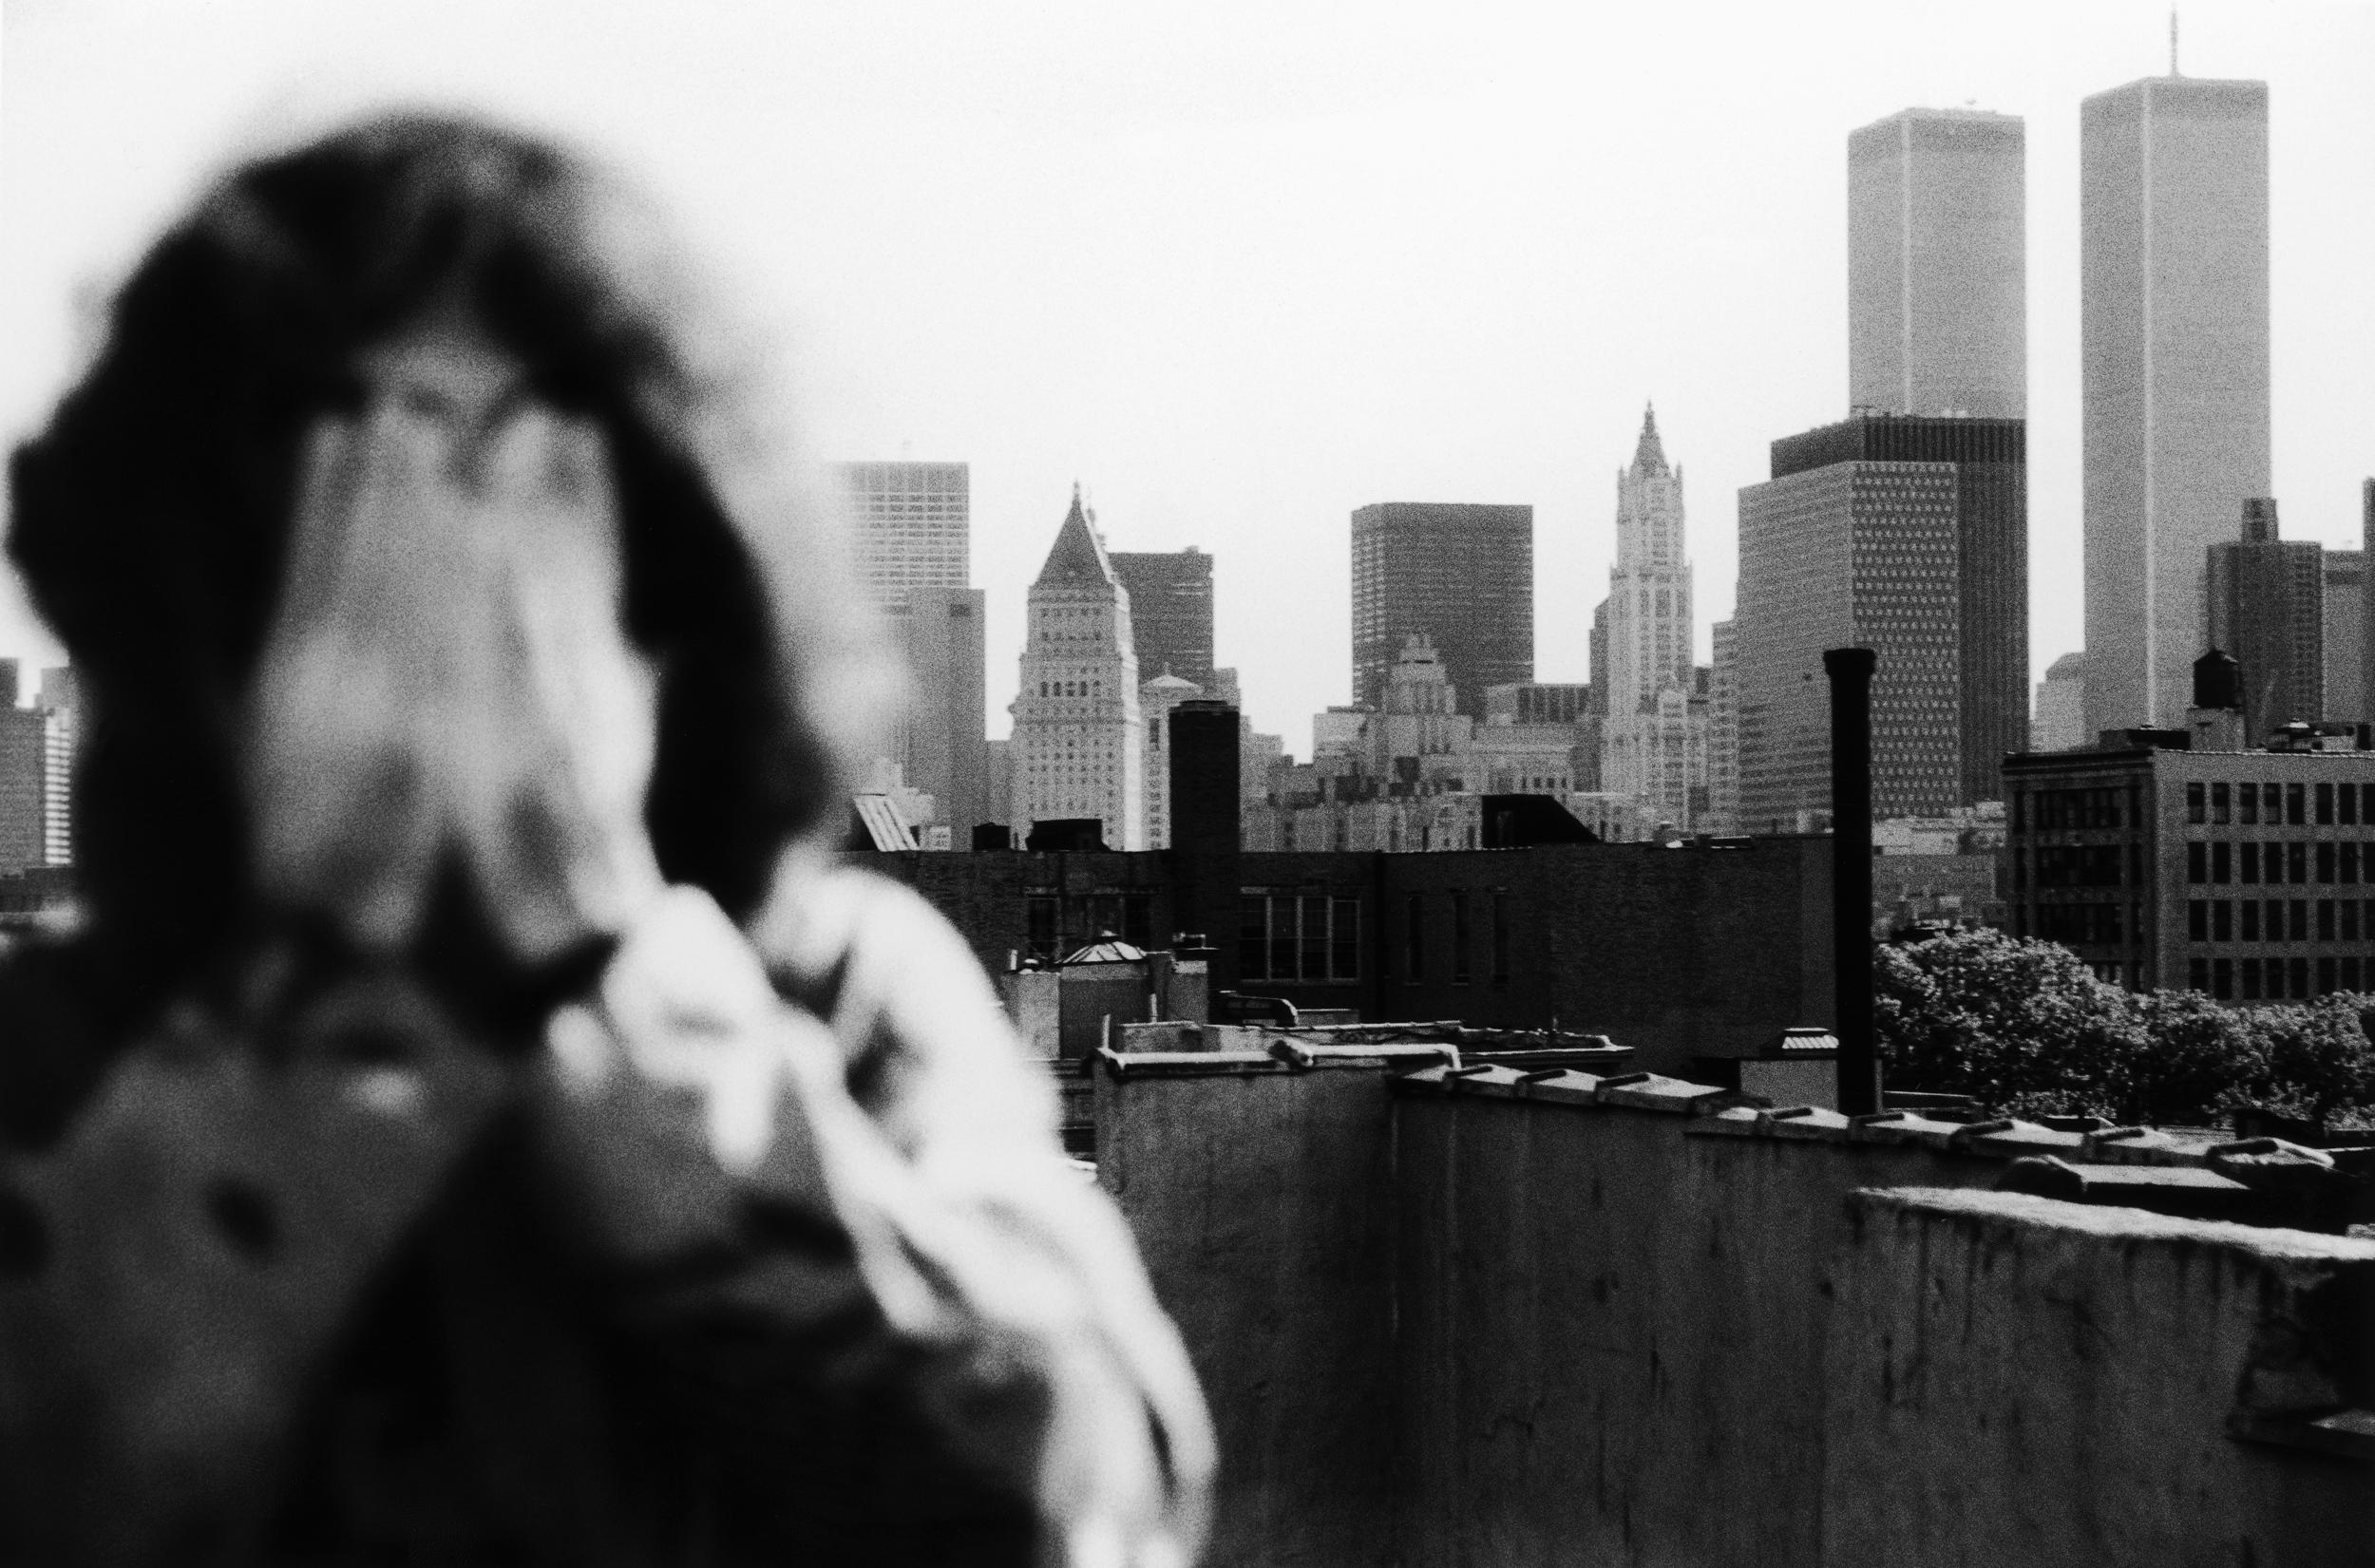 Danny Paradise in East Village, New York 1999. Photo Kia Naddermier